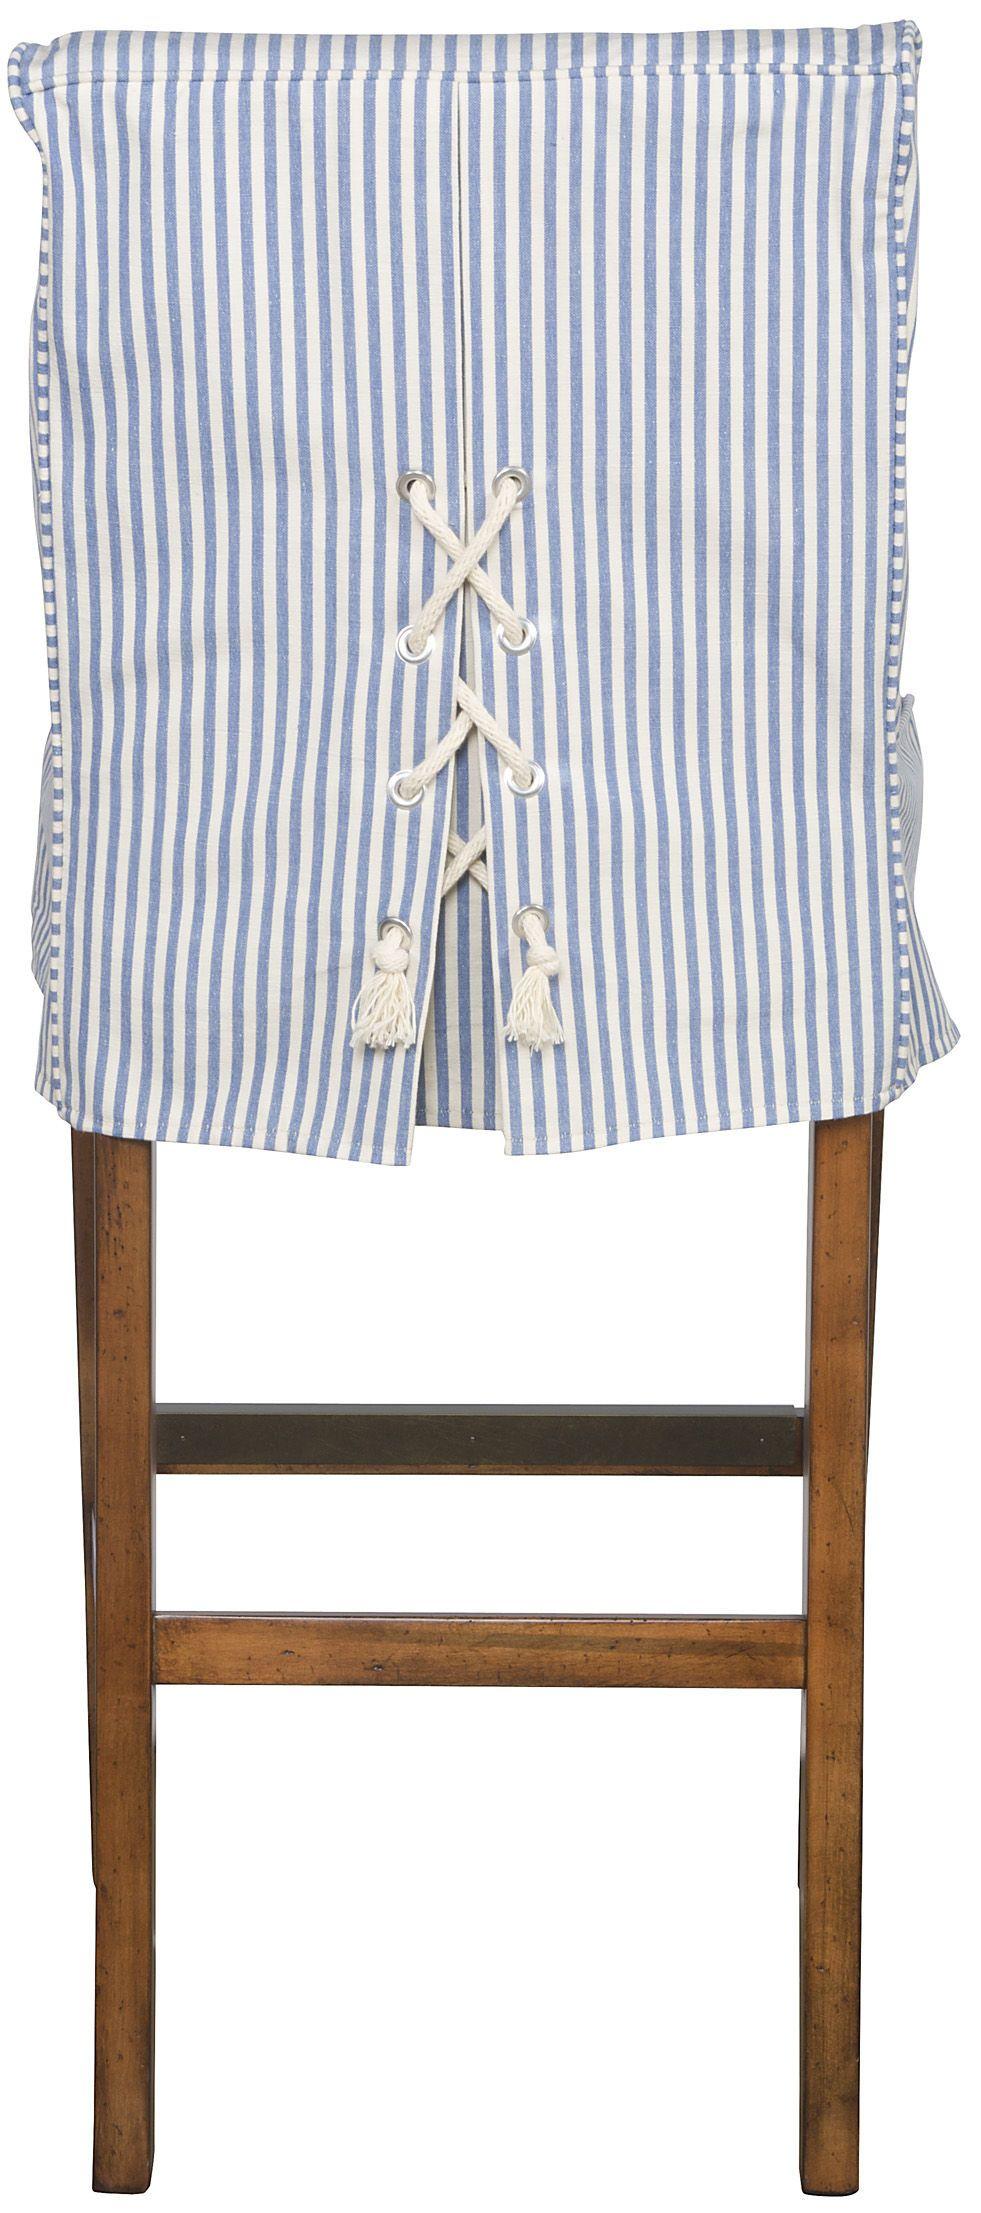 Slipcover Bar Stool Slipcovers For Chairs Slipcovers Bar Stool